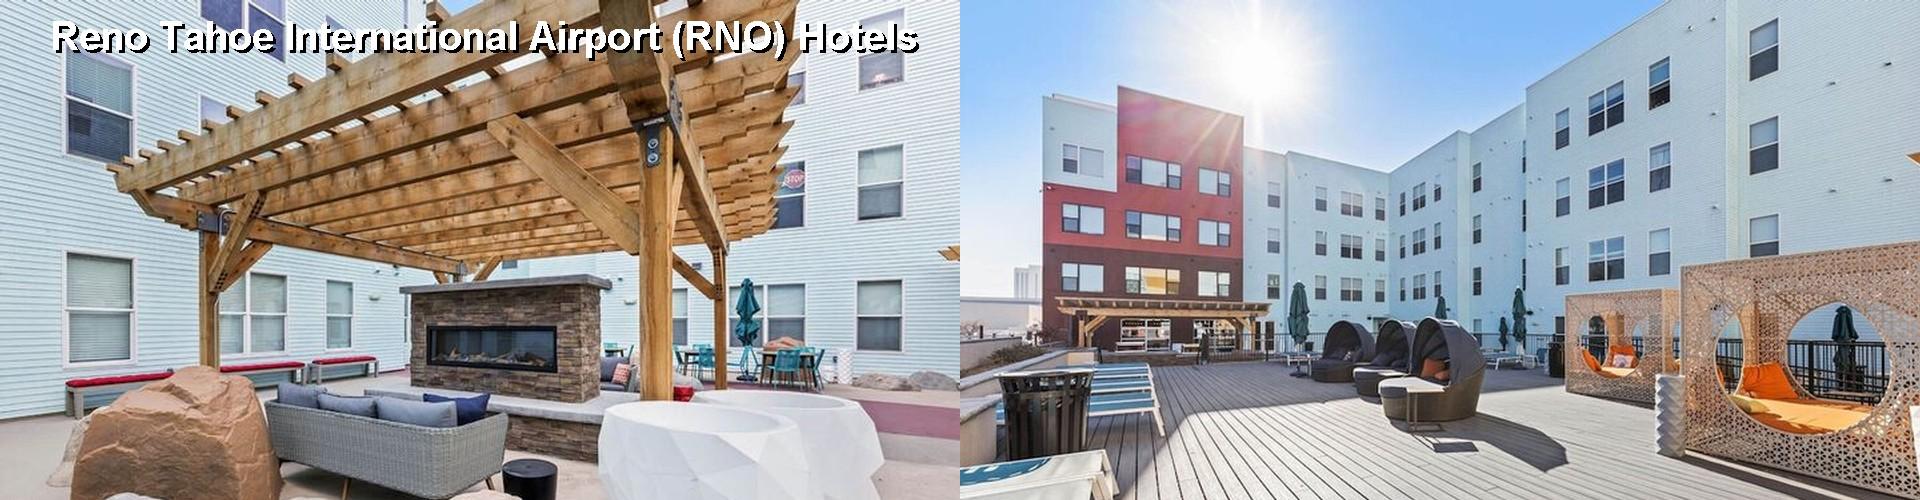 5 Best Hotels Near Reno Tahoe International Airport Rno